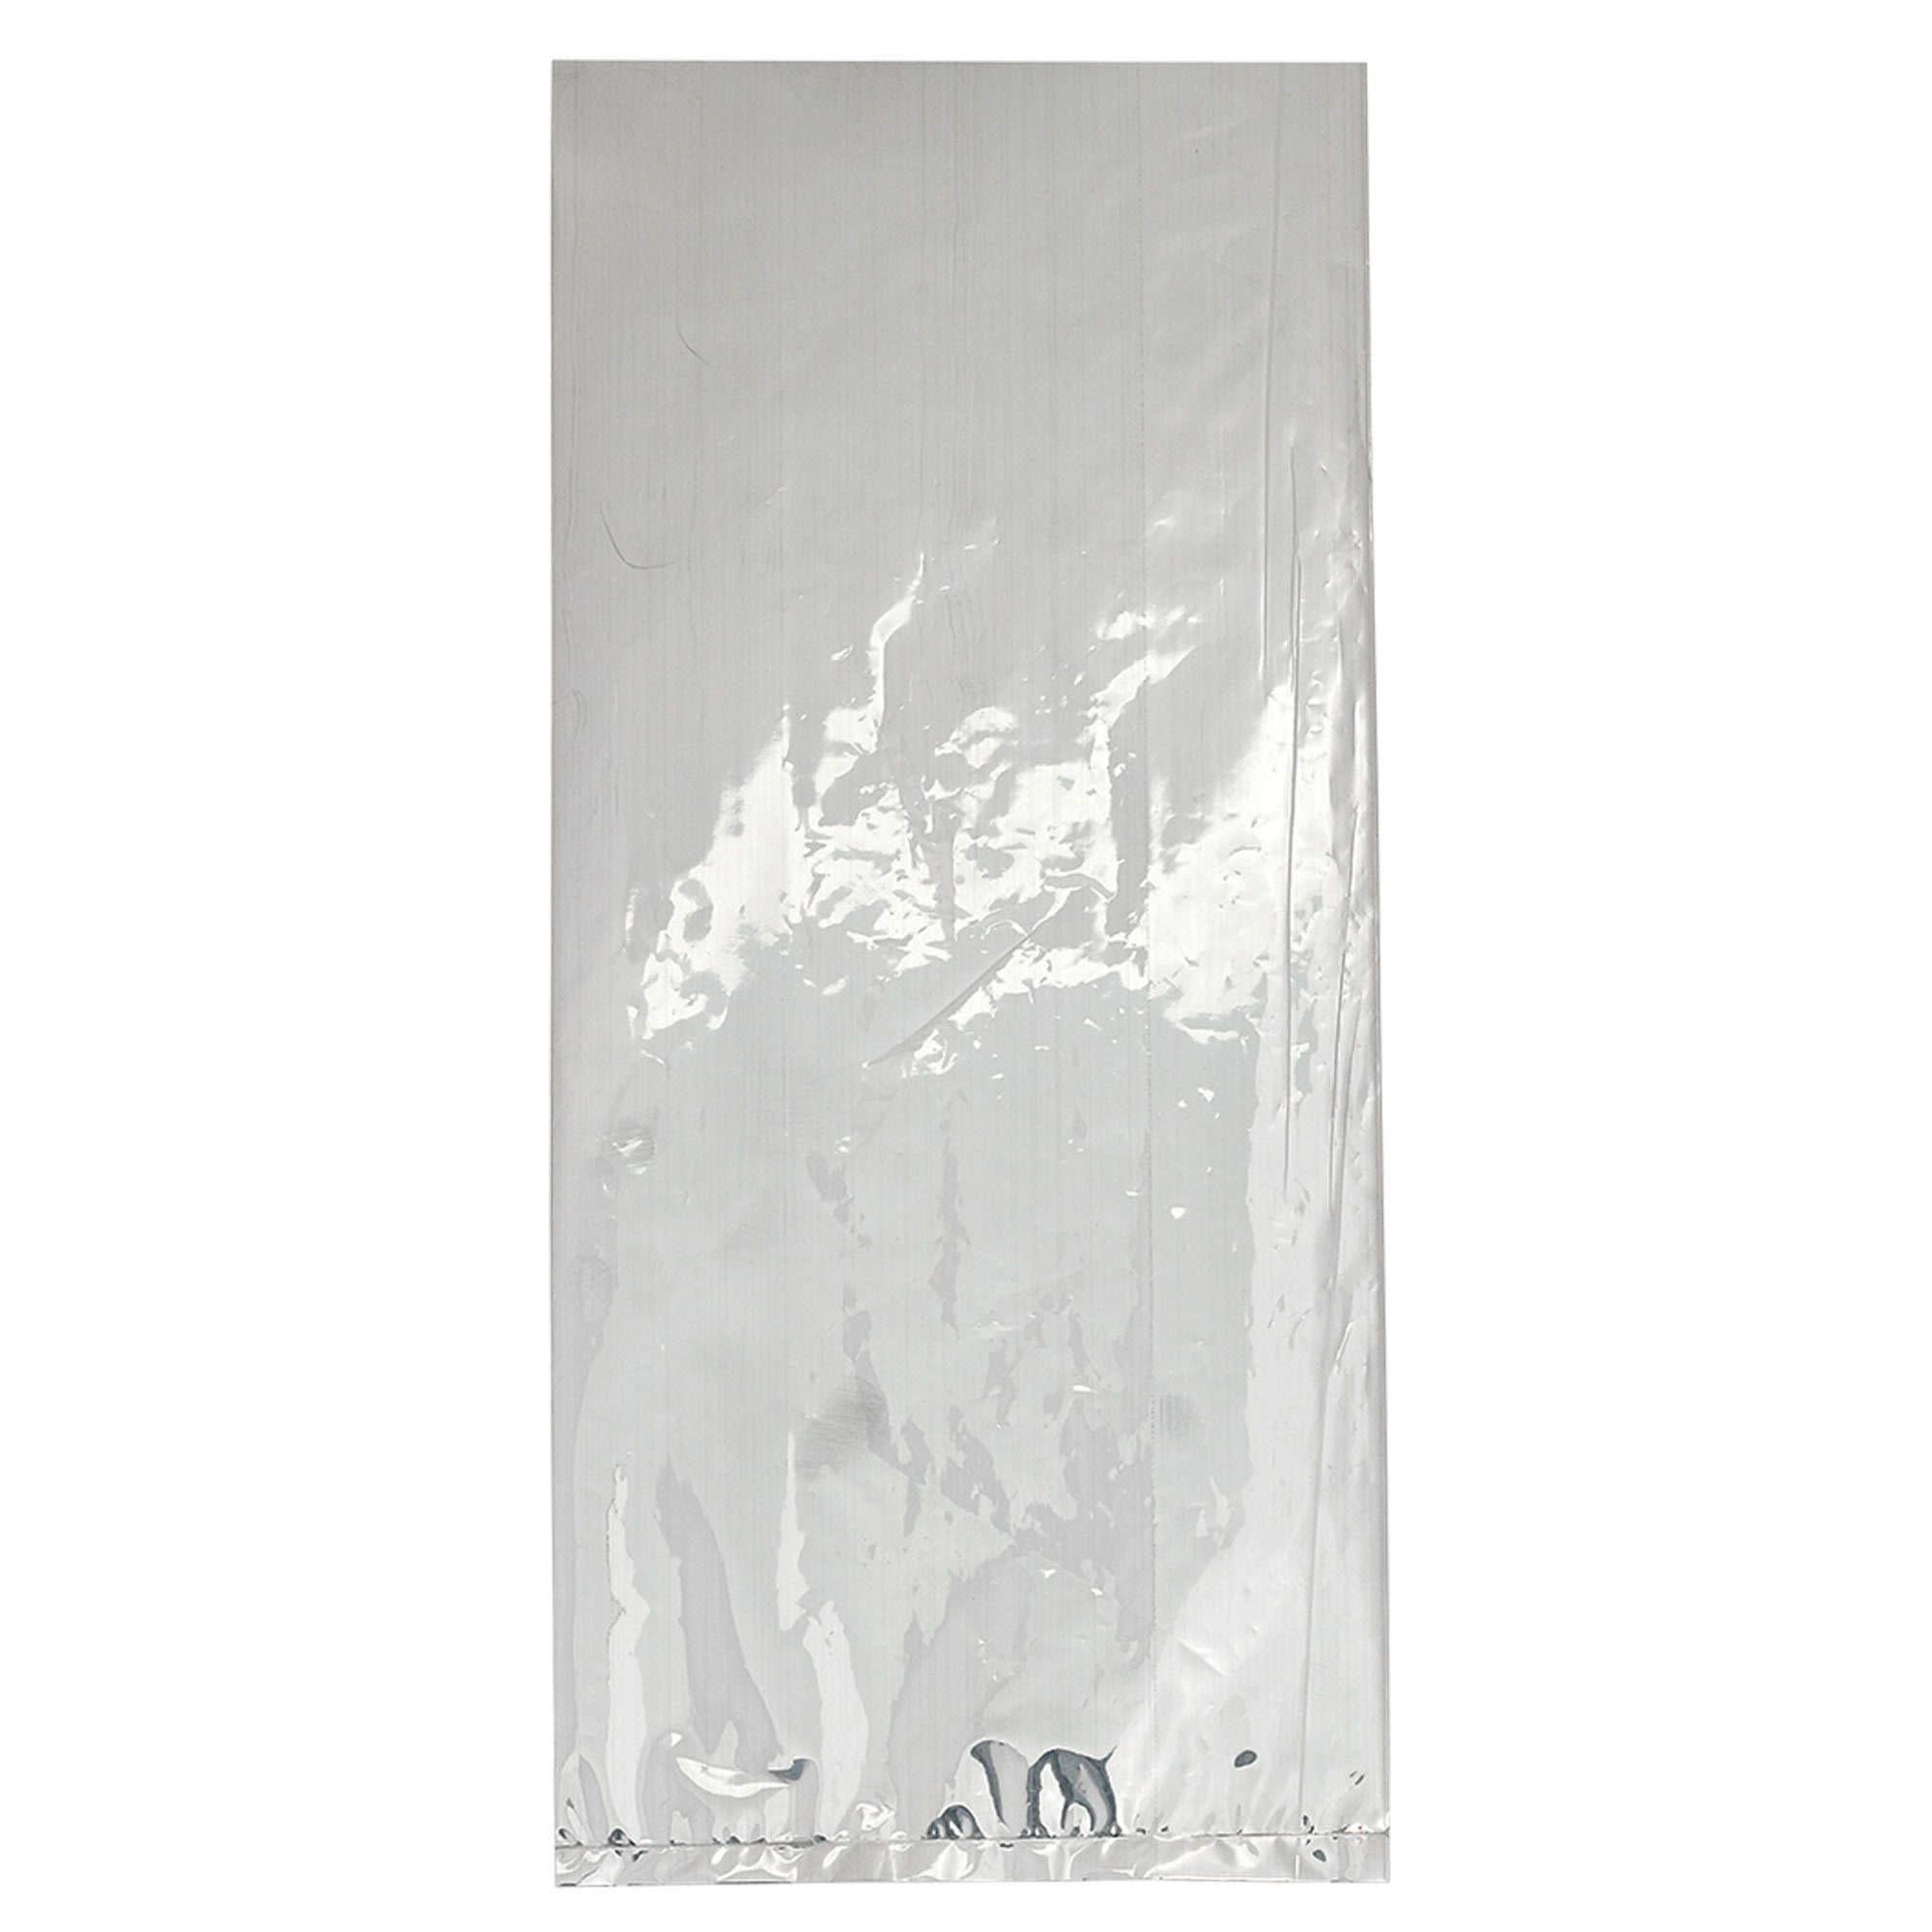 Small Cello Party Bag Silver Foil